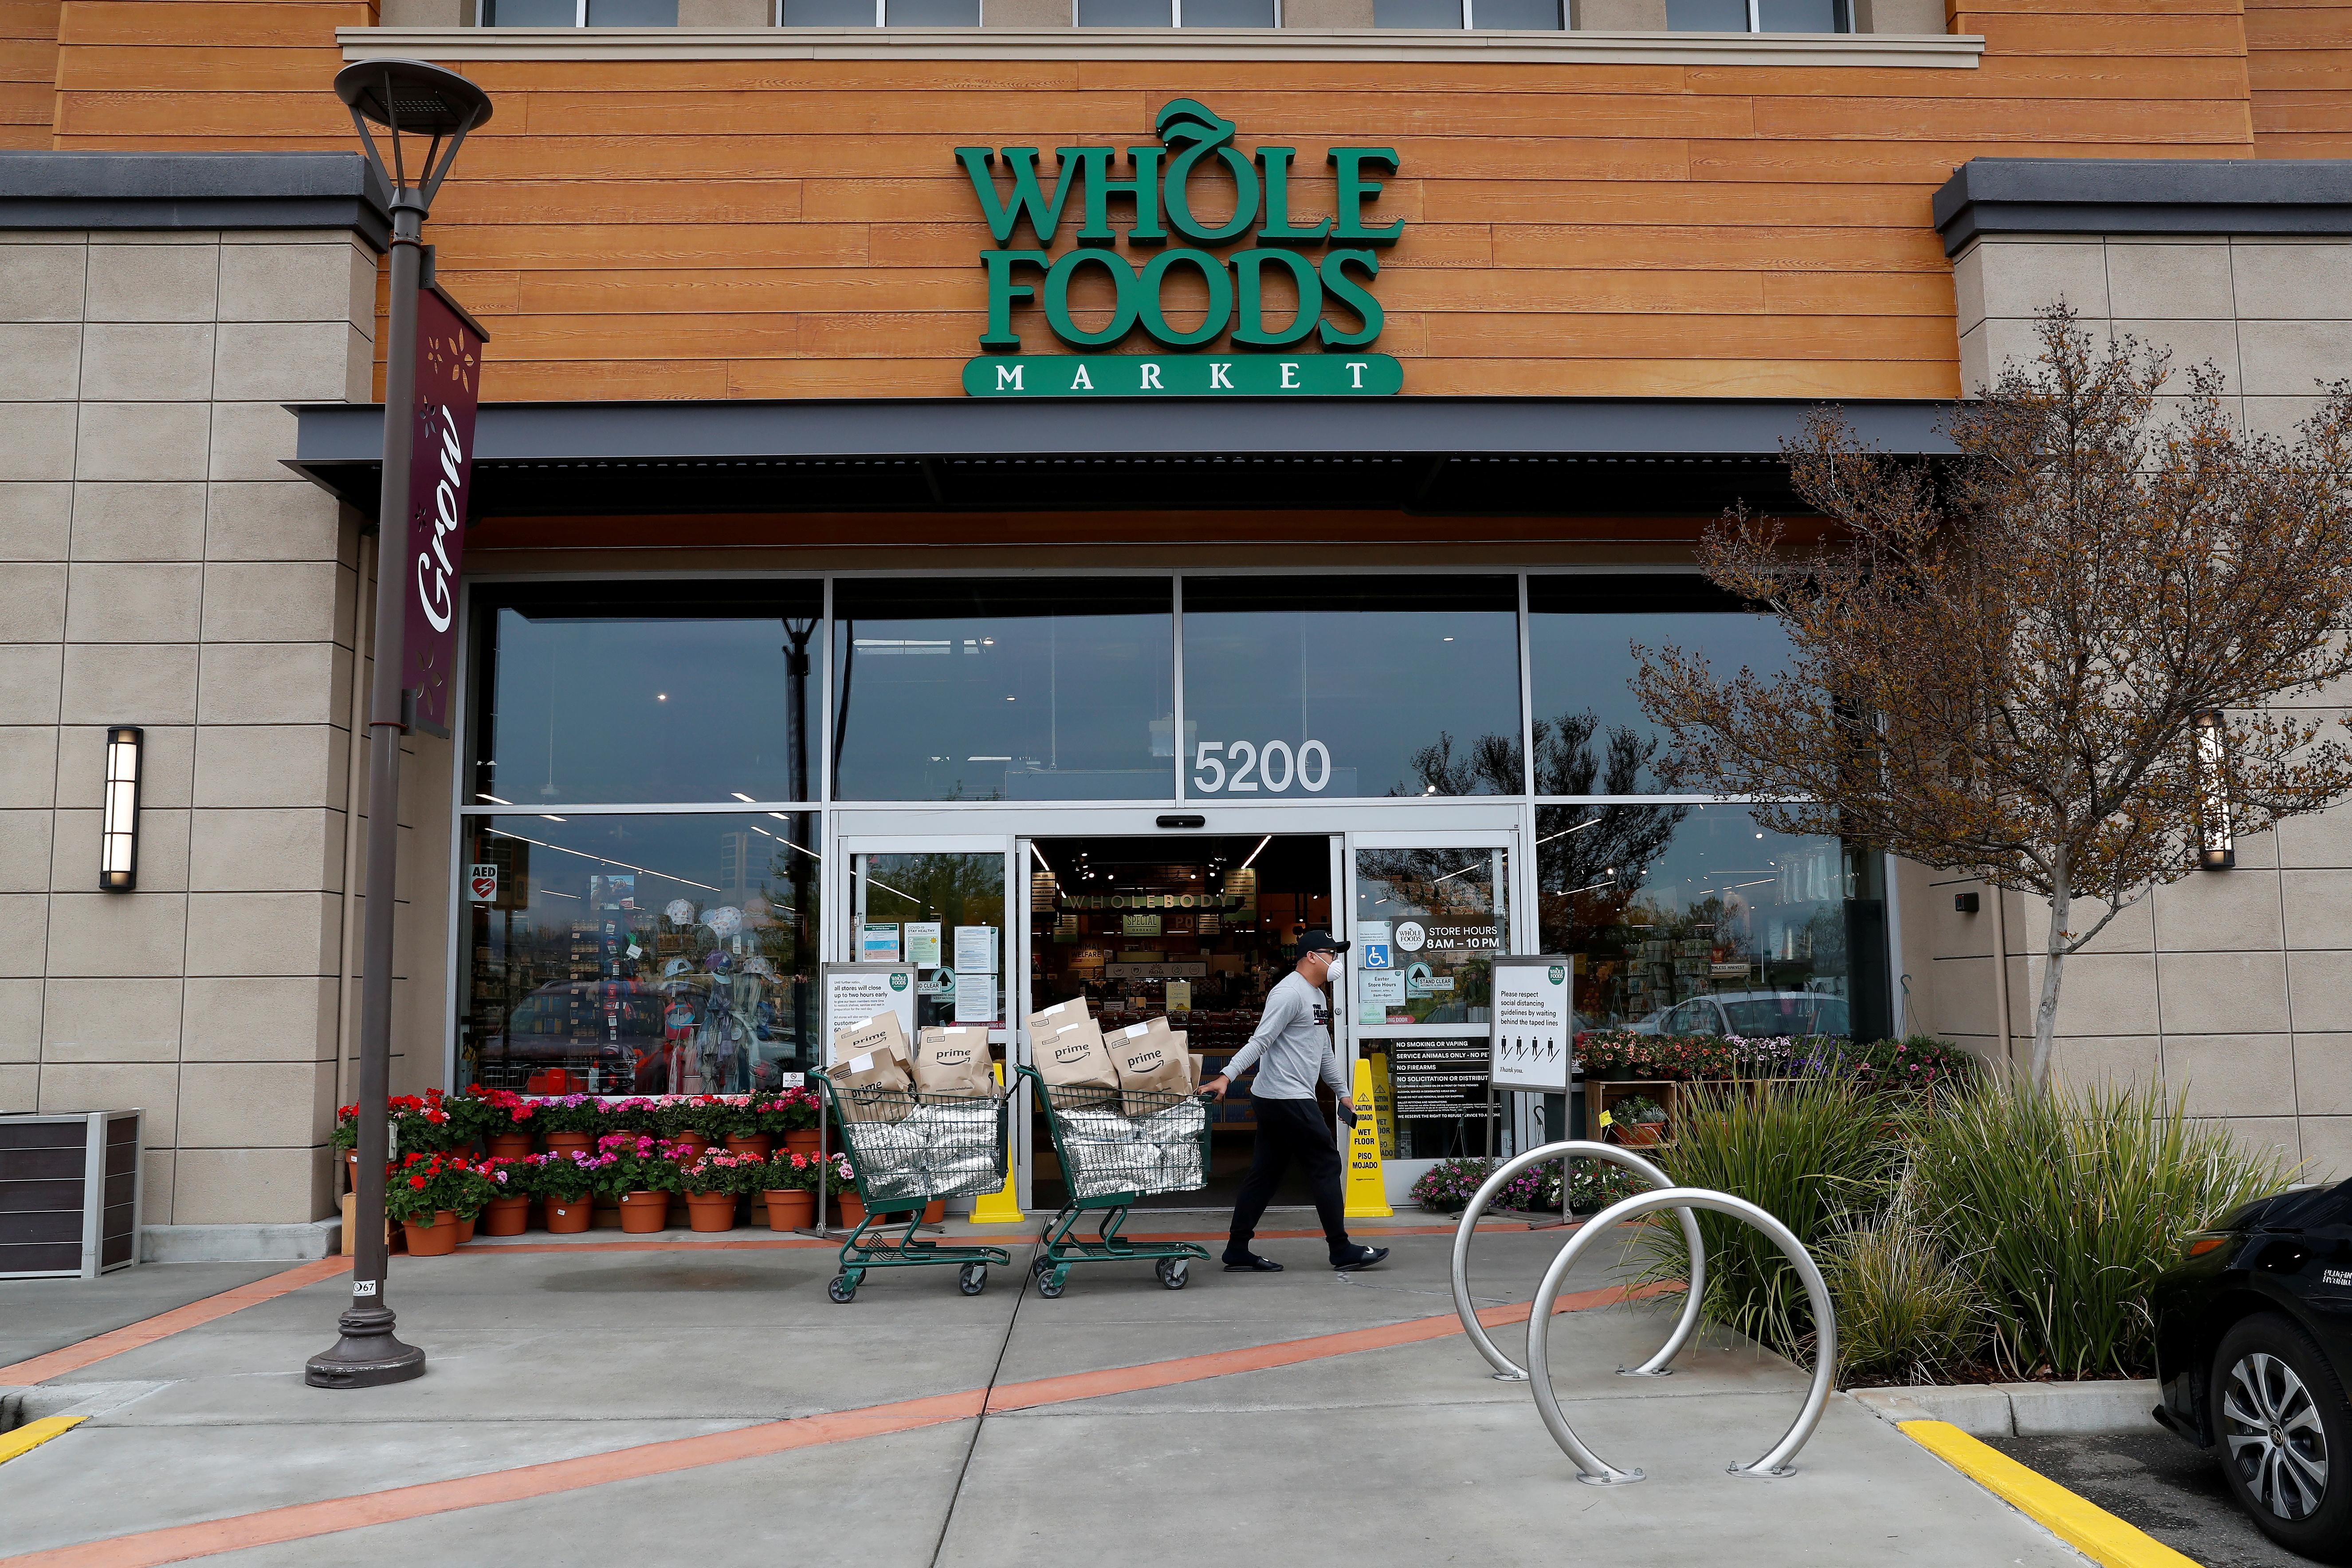 A Whole Foods Market n Dublin, California, U.S., April 6, 2020. REUTERS/Shannon Stapleton